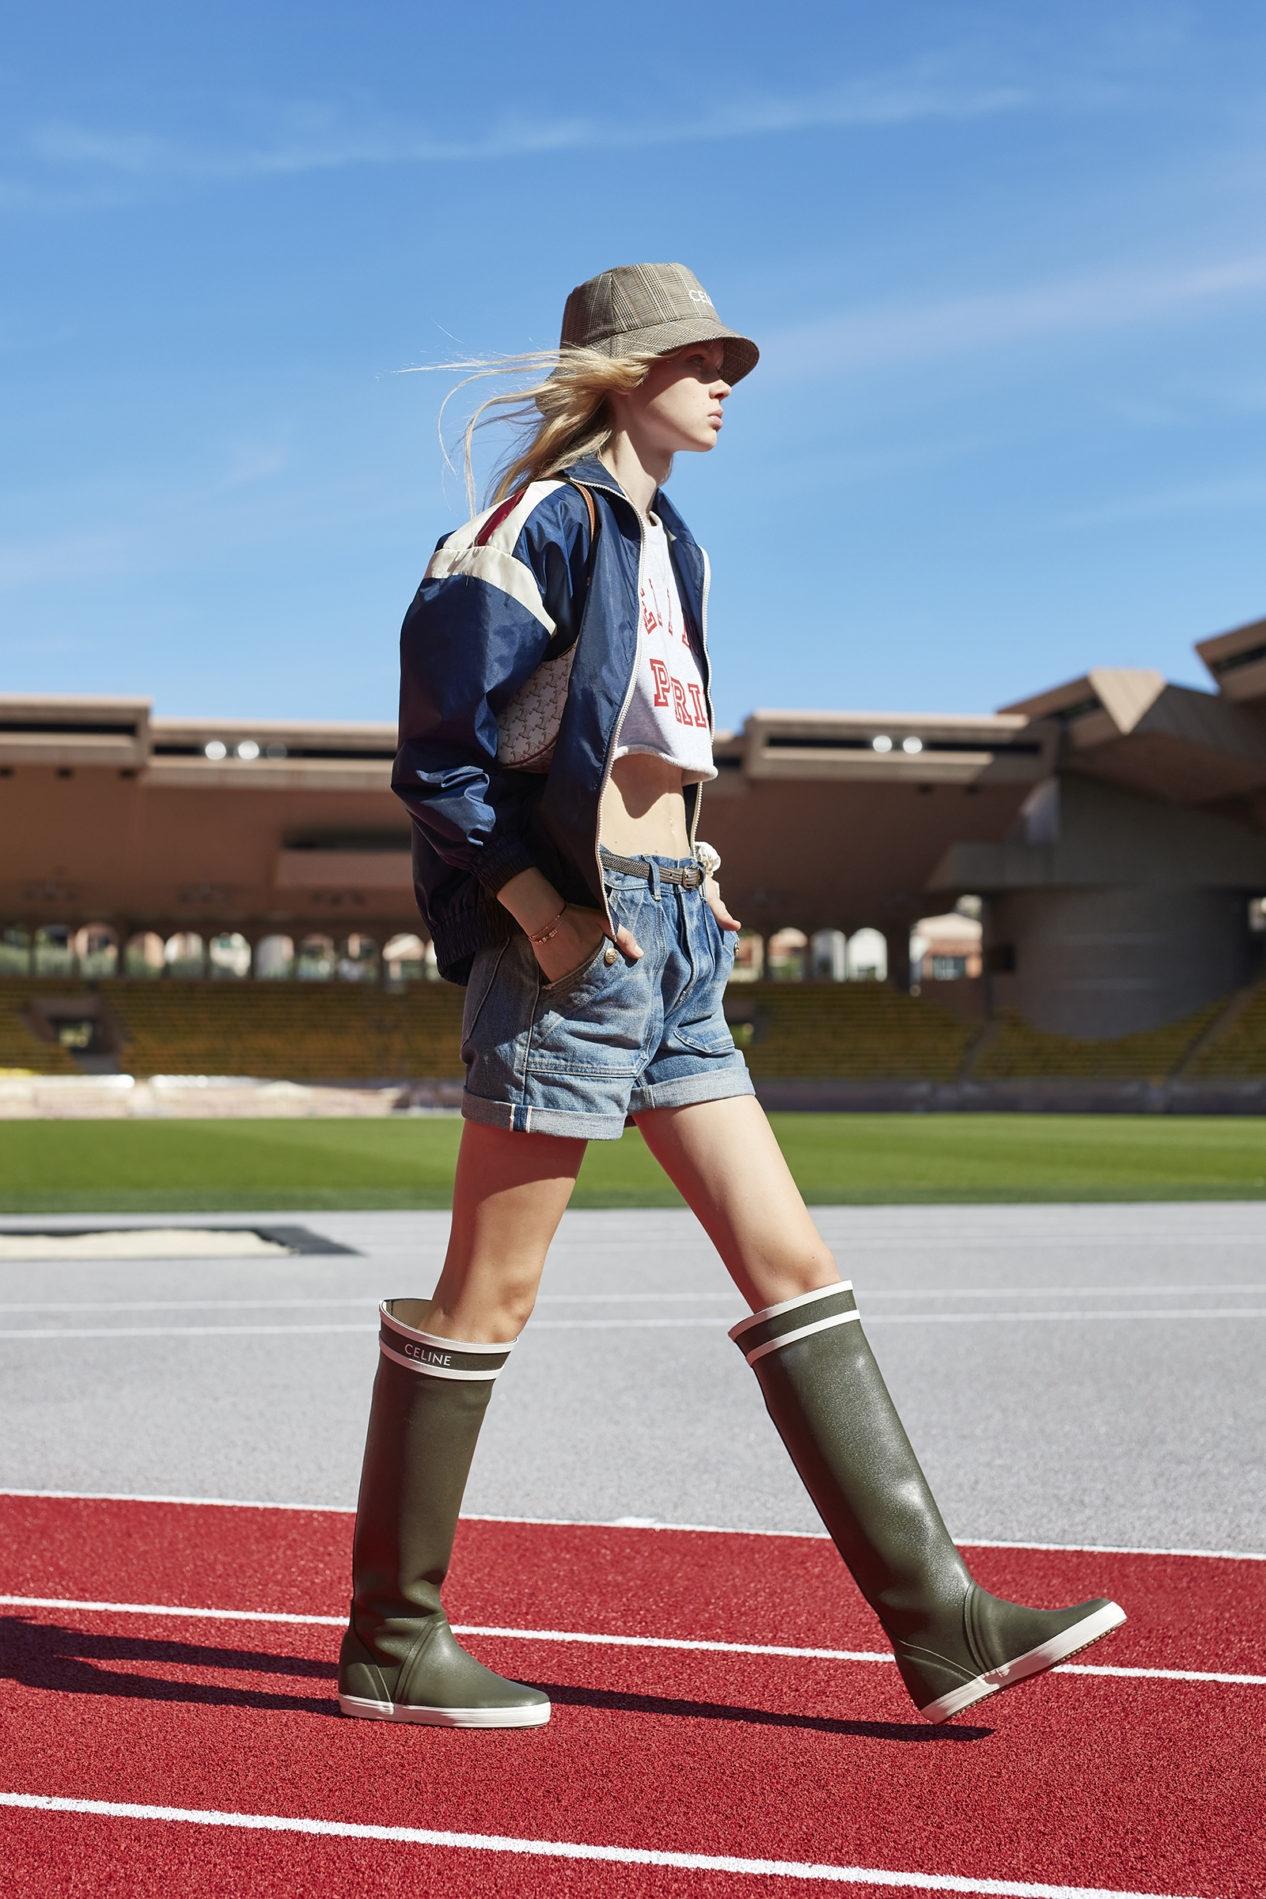 Французская романтика и спорт: Celine показали новую коллекцию весна-лето 2021 (ФОТО) - фото №5